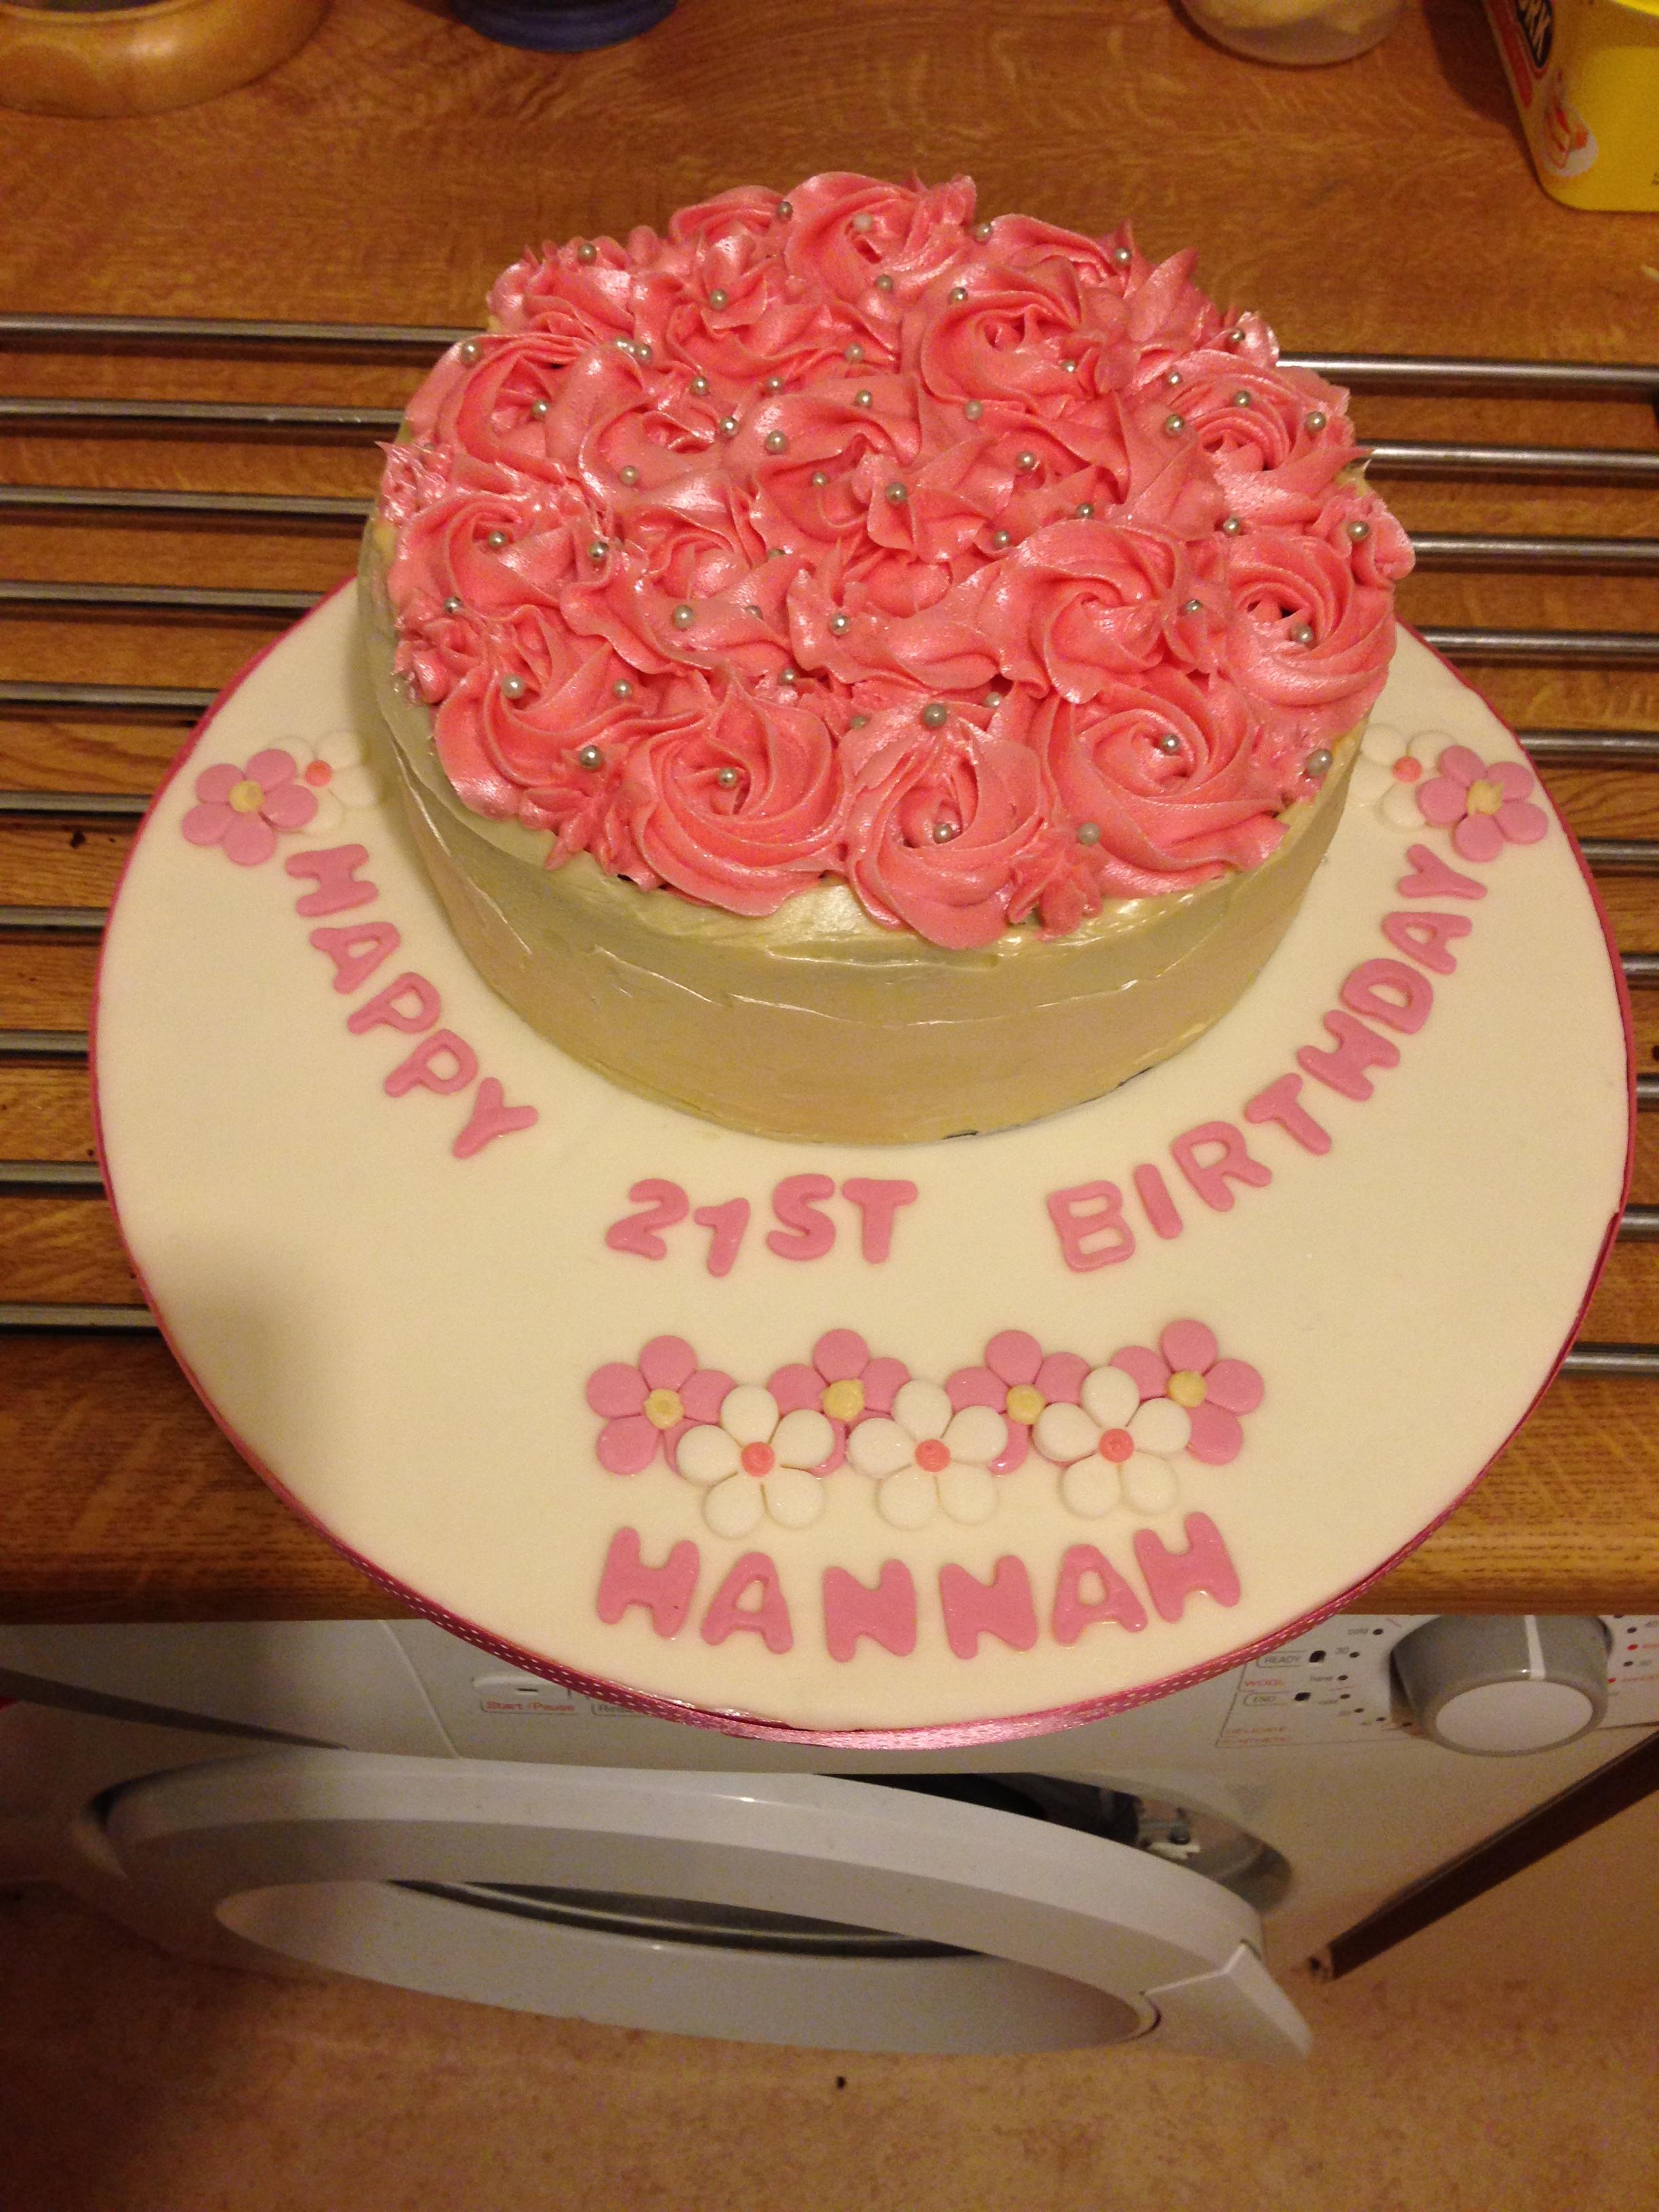 21st And 70th Birthday Cake Making